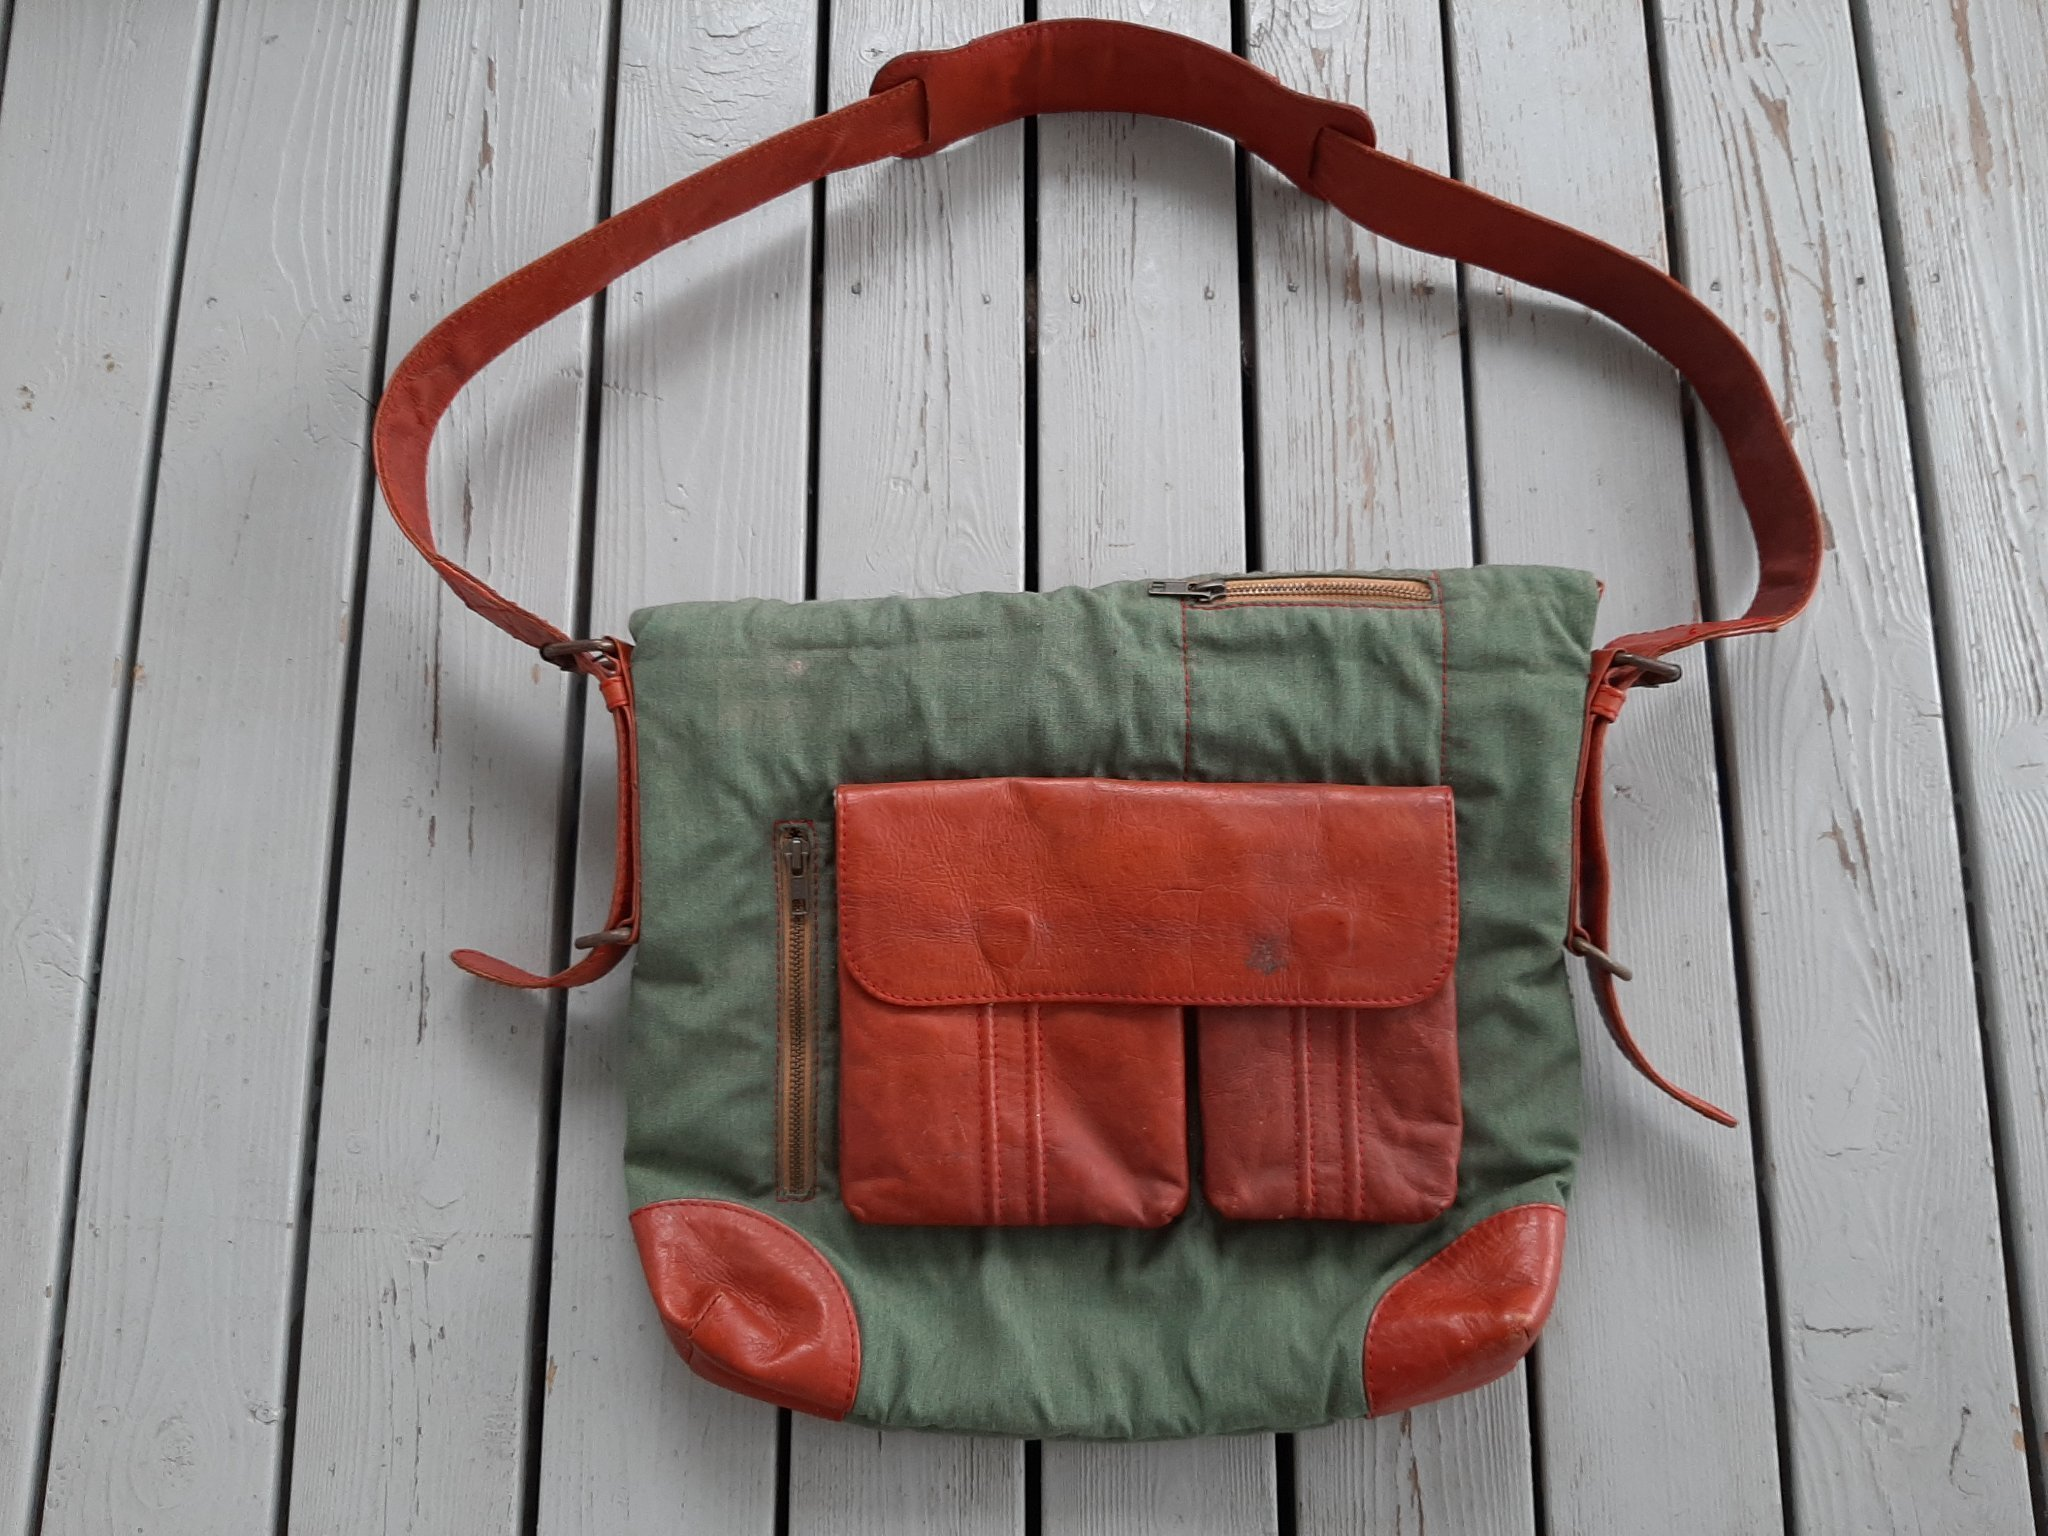 Snygg udda grön brun vintage skinn textil axelväska axelrem axel väska bag retro